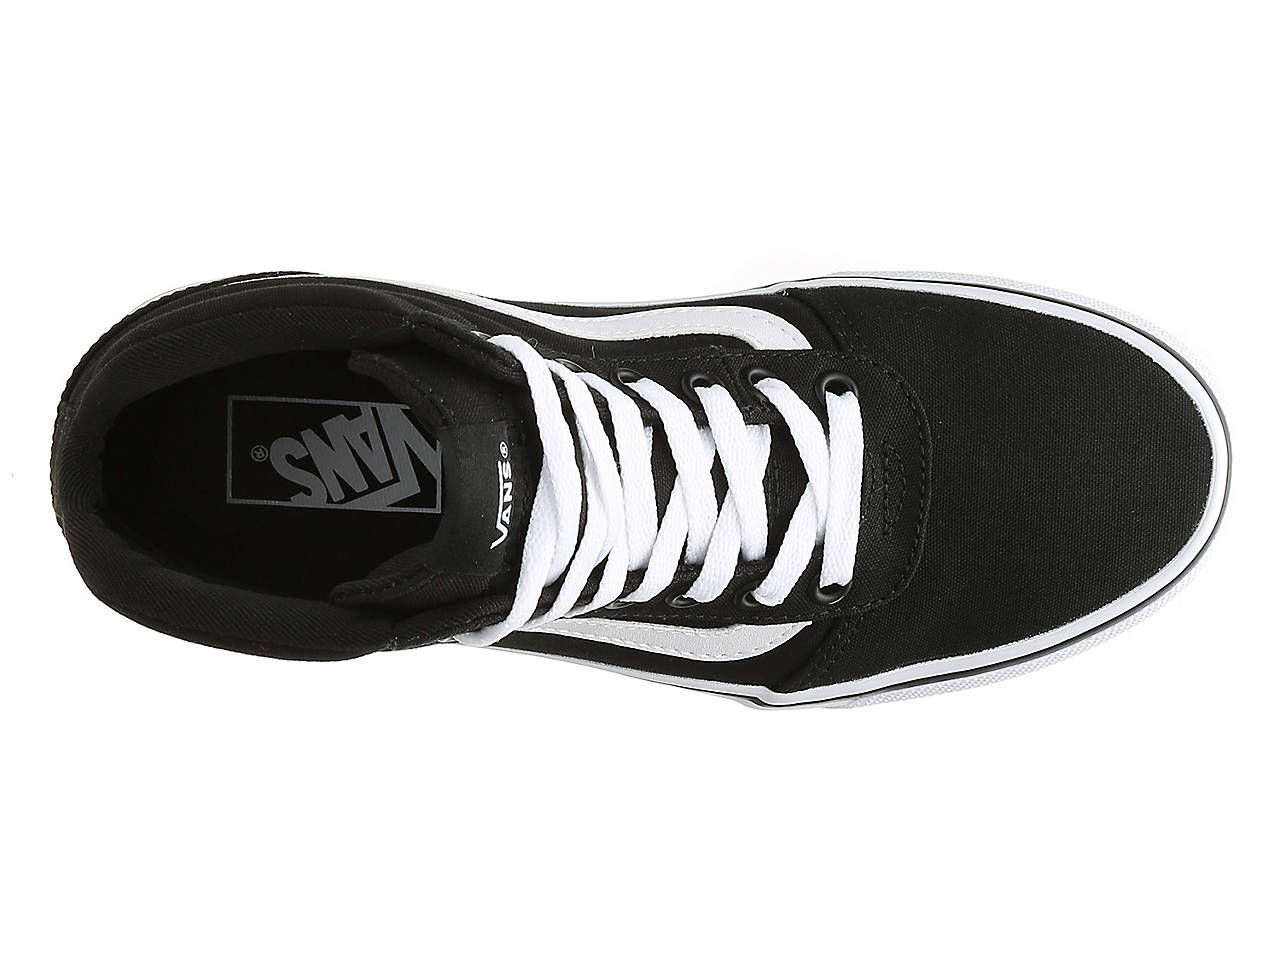 Vans Ward High-Top Sneaker - Women s Women s Shoes  7b1c782bb